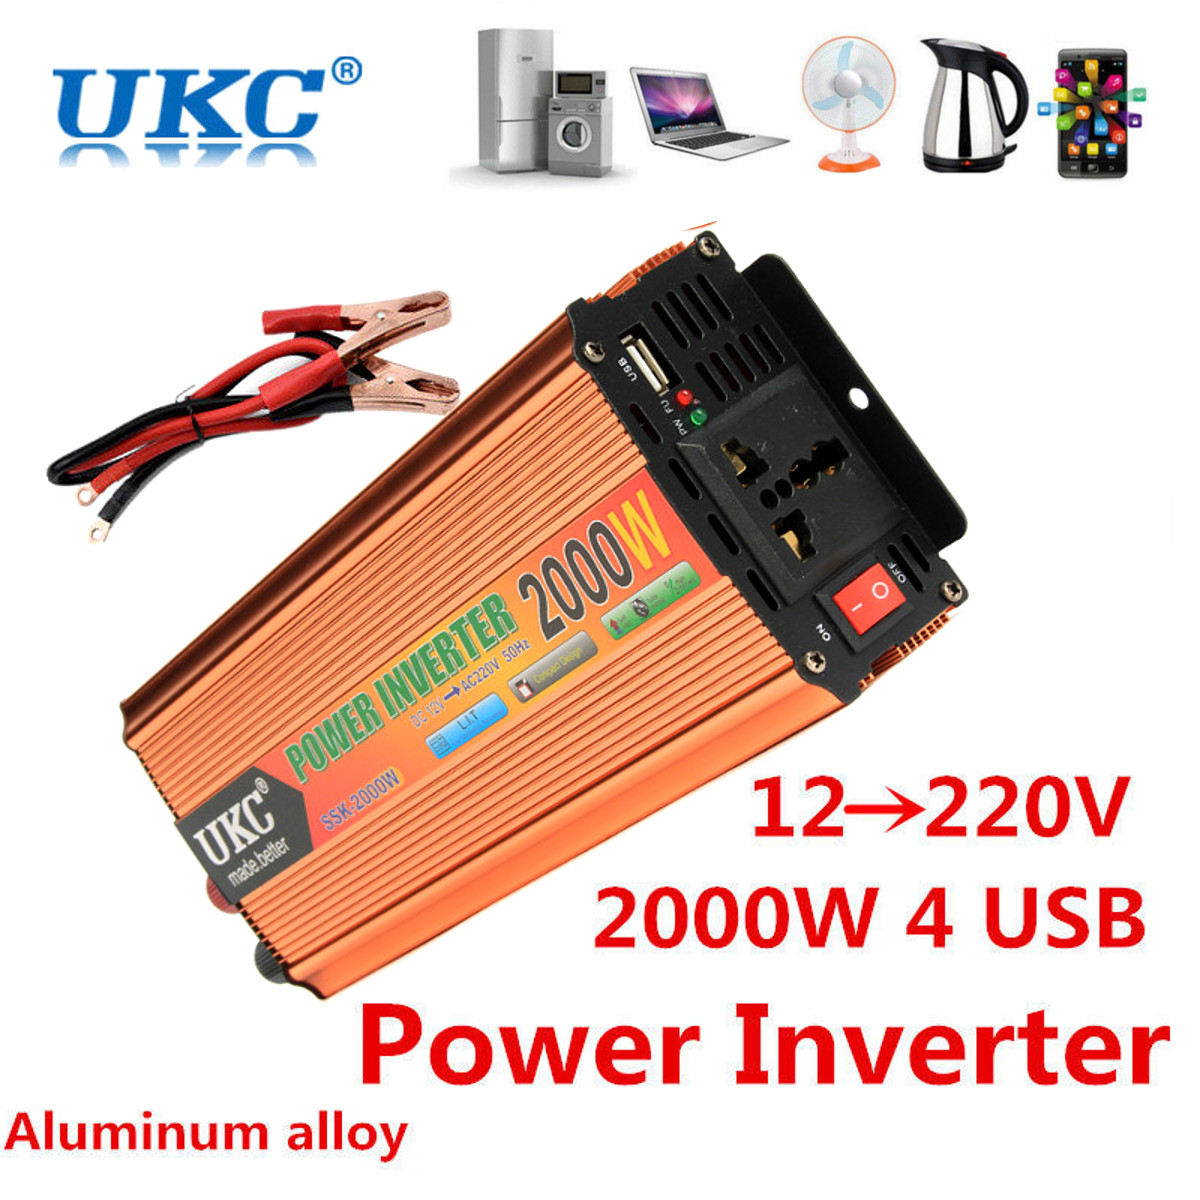 Car Power Inverter Dc 12v To Ac 230v 1500w Vehicle 31a Usb Adapter Using 555 220v Peak 600 1000 2000 4000w Voltage Transformer